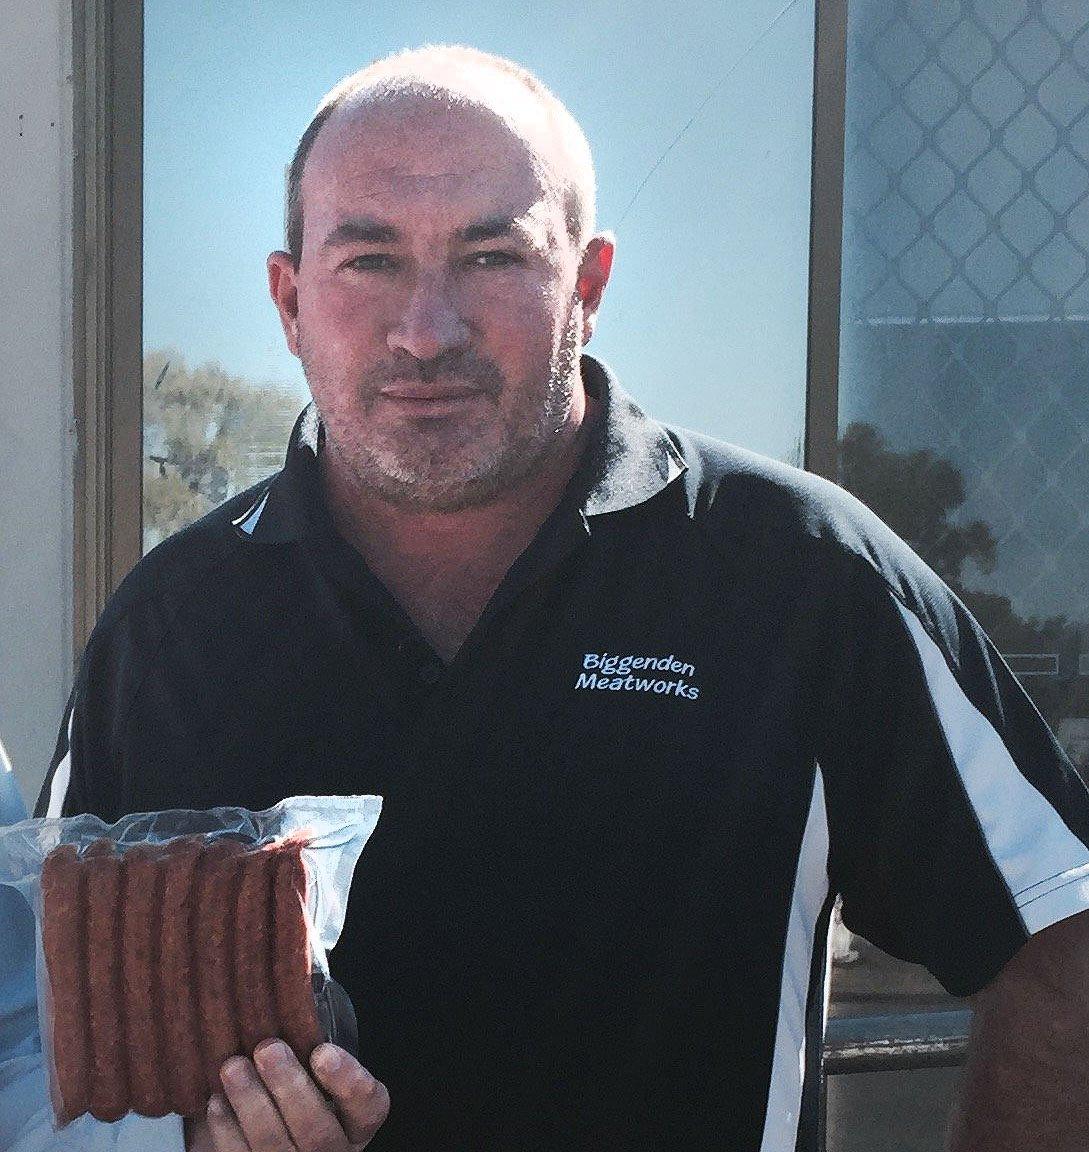 Biggenden Meatworks company director Peter Gibbs.